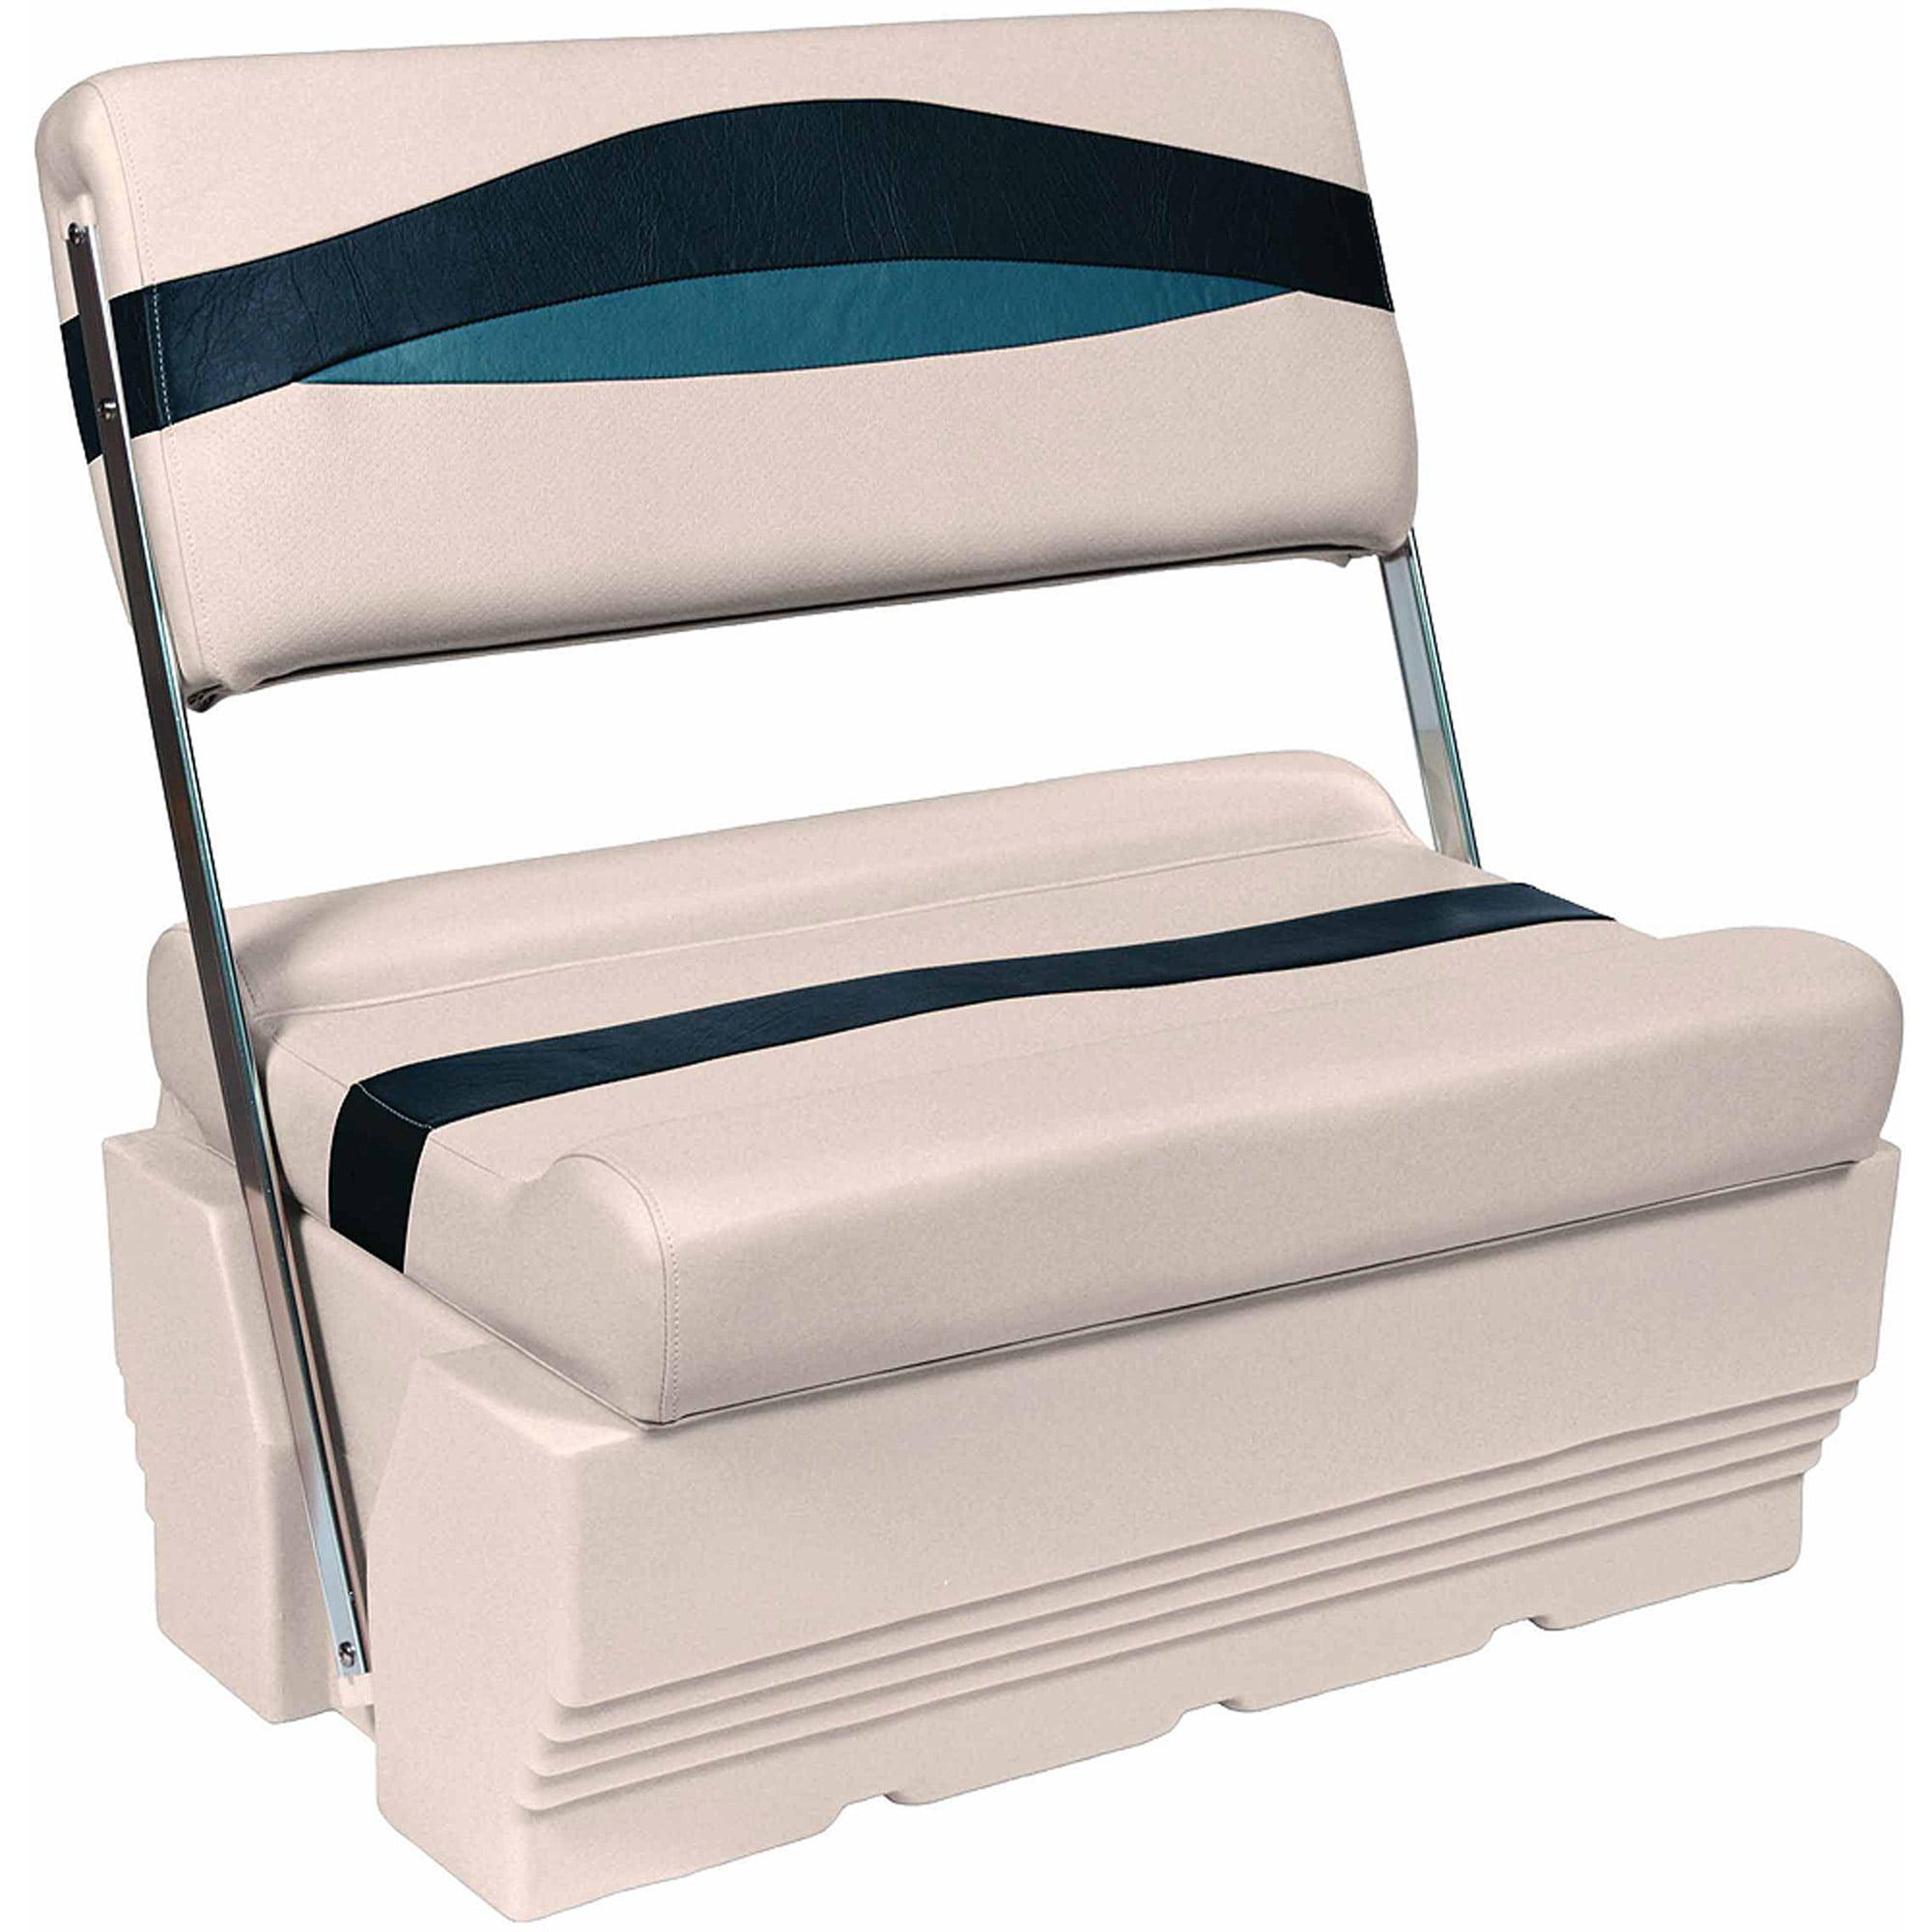 Wise Premier Series Pontoon Flip Flop Bench Seat and Base